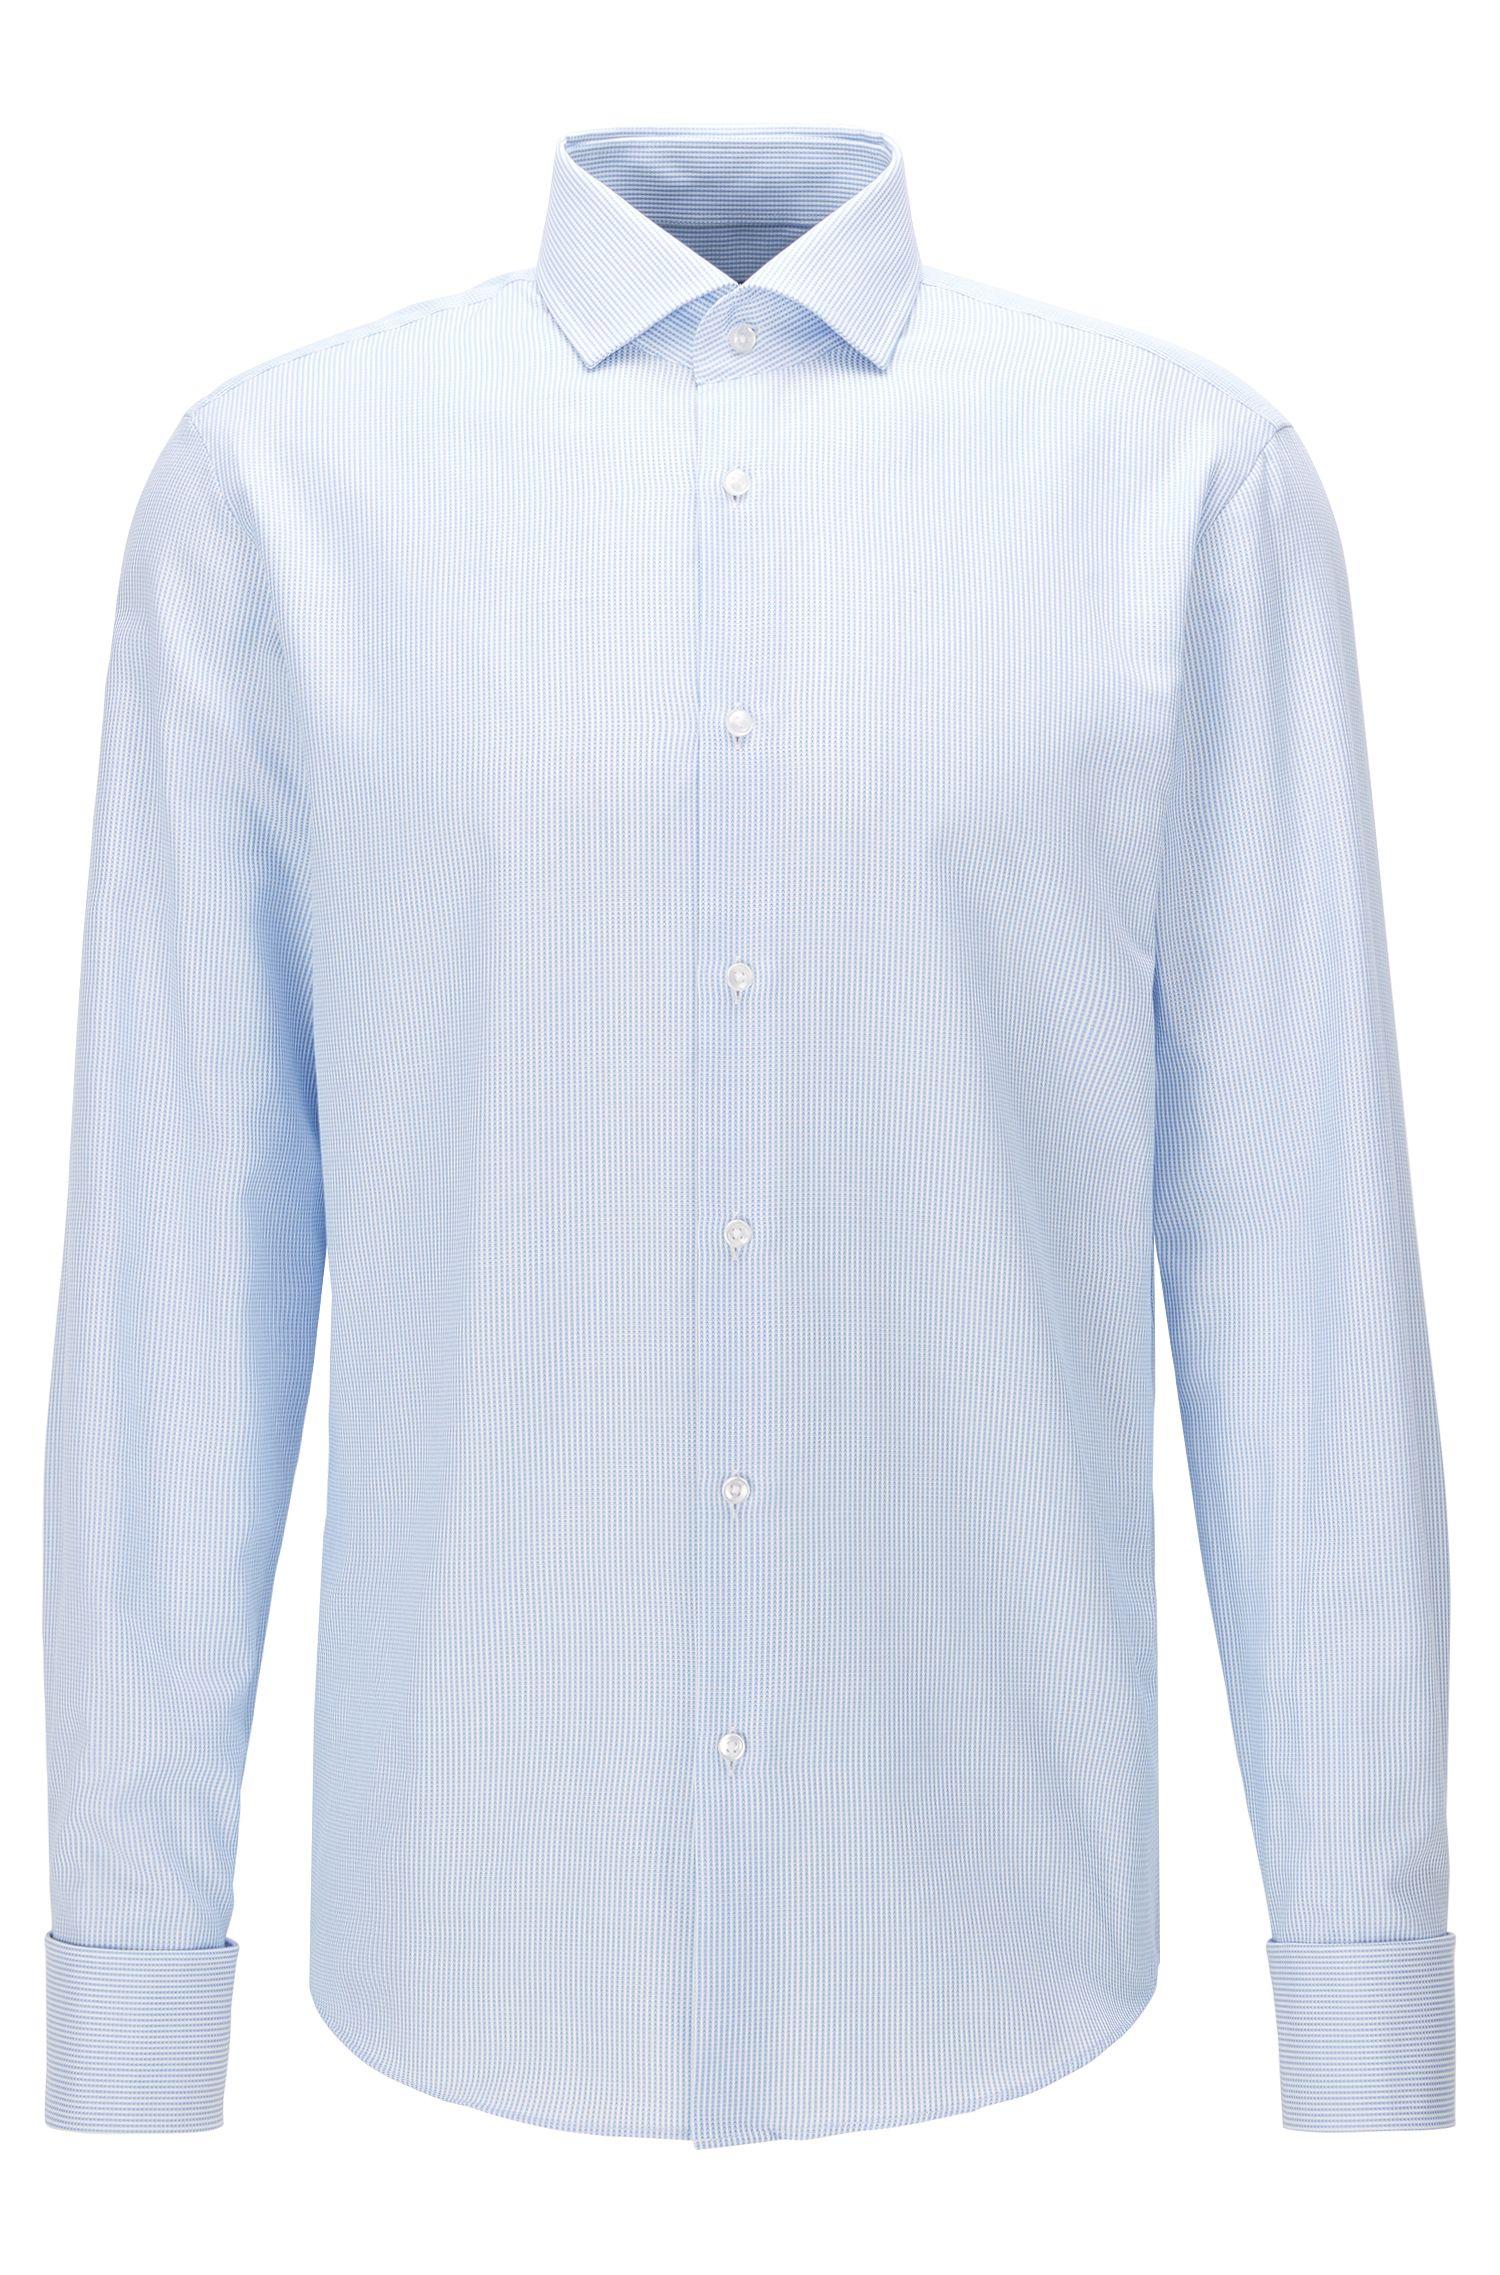 Dobby Cotton Dress Shirt, Regular Fit   Gardner